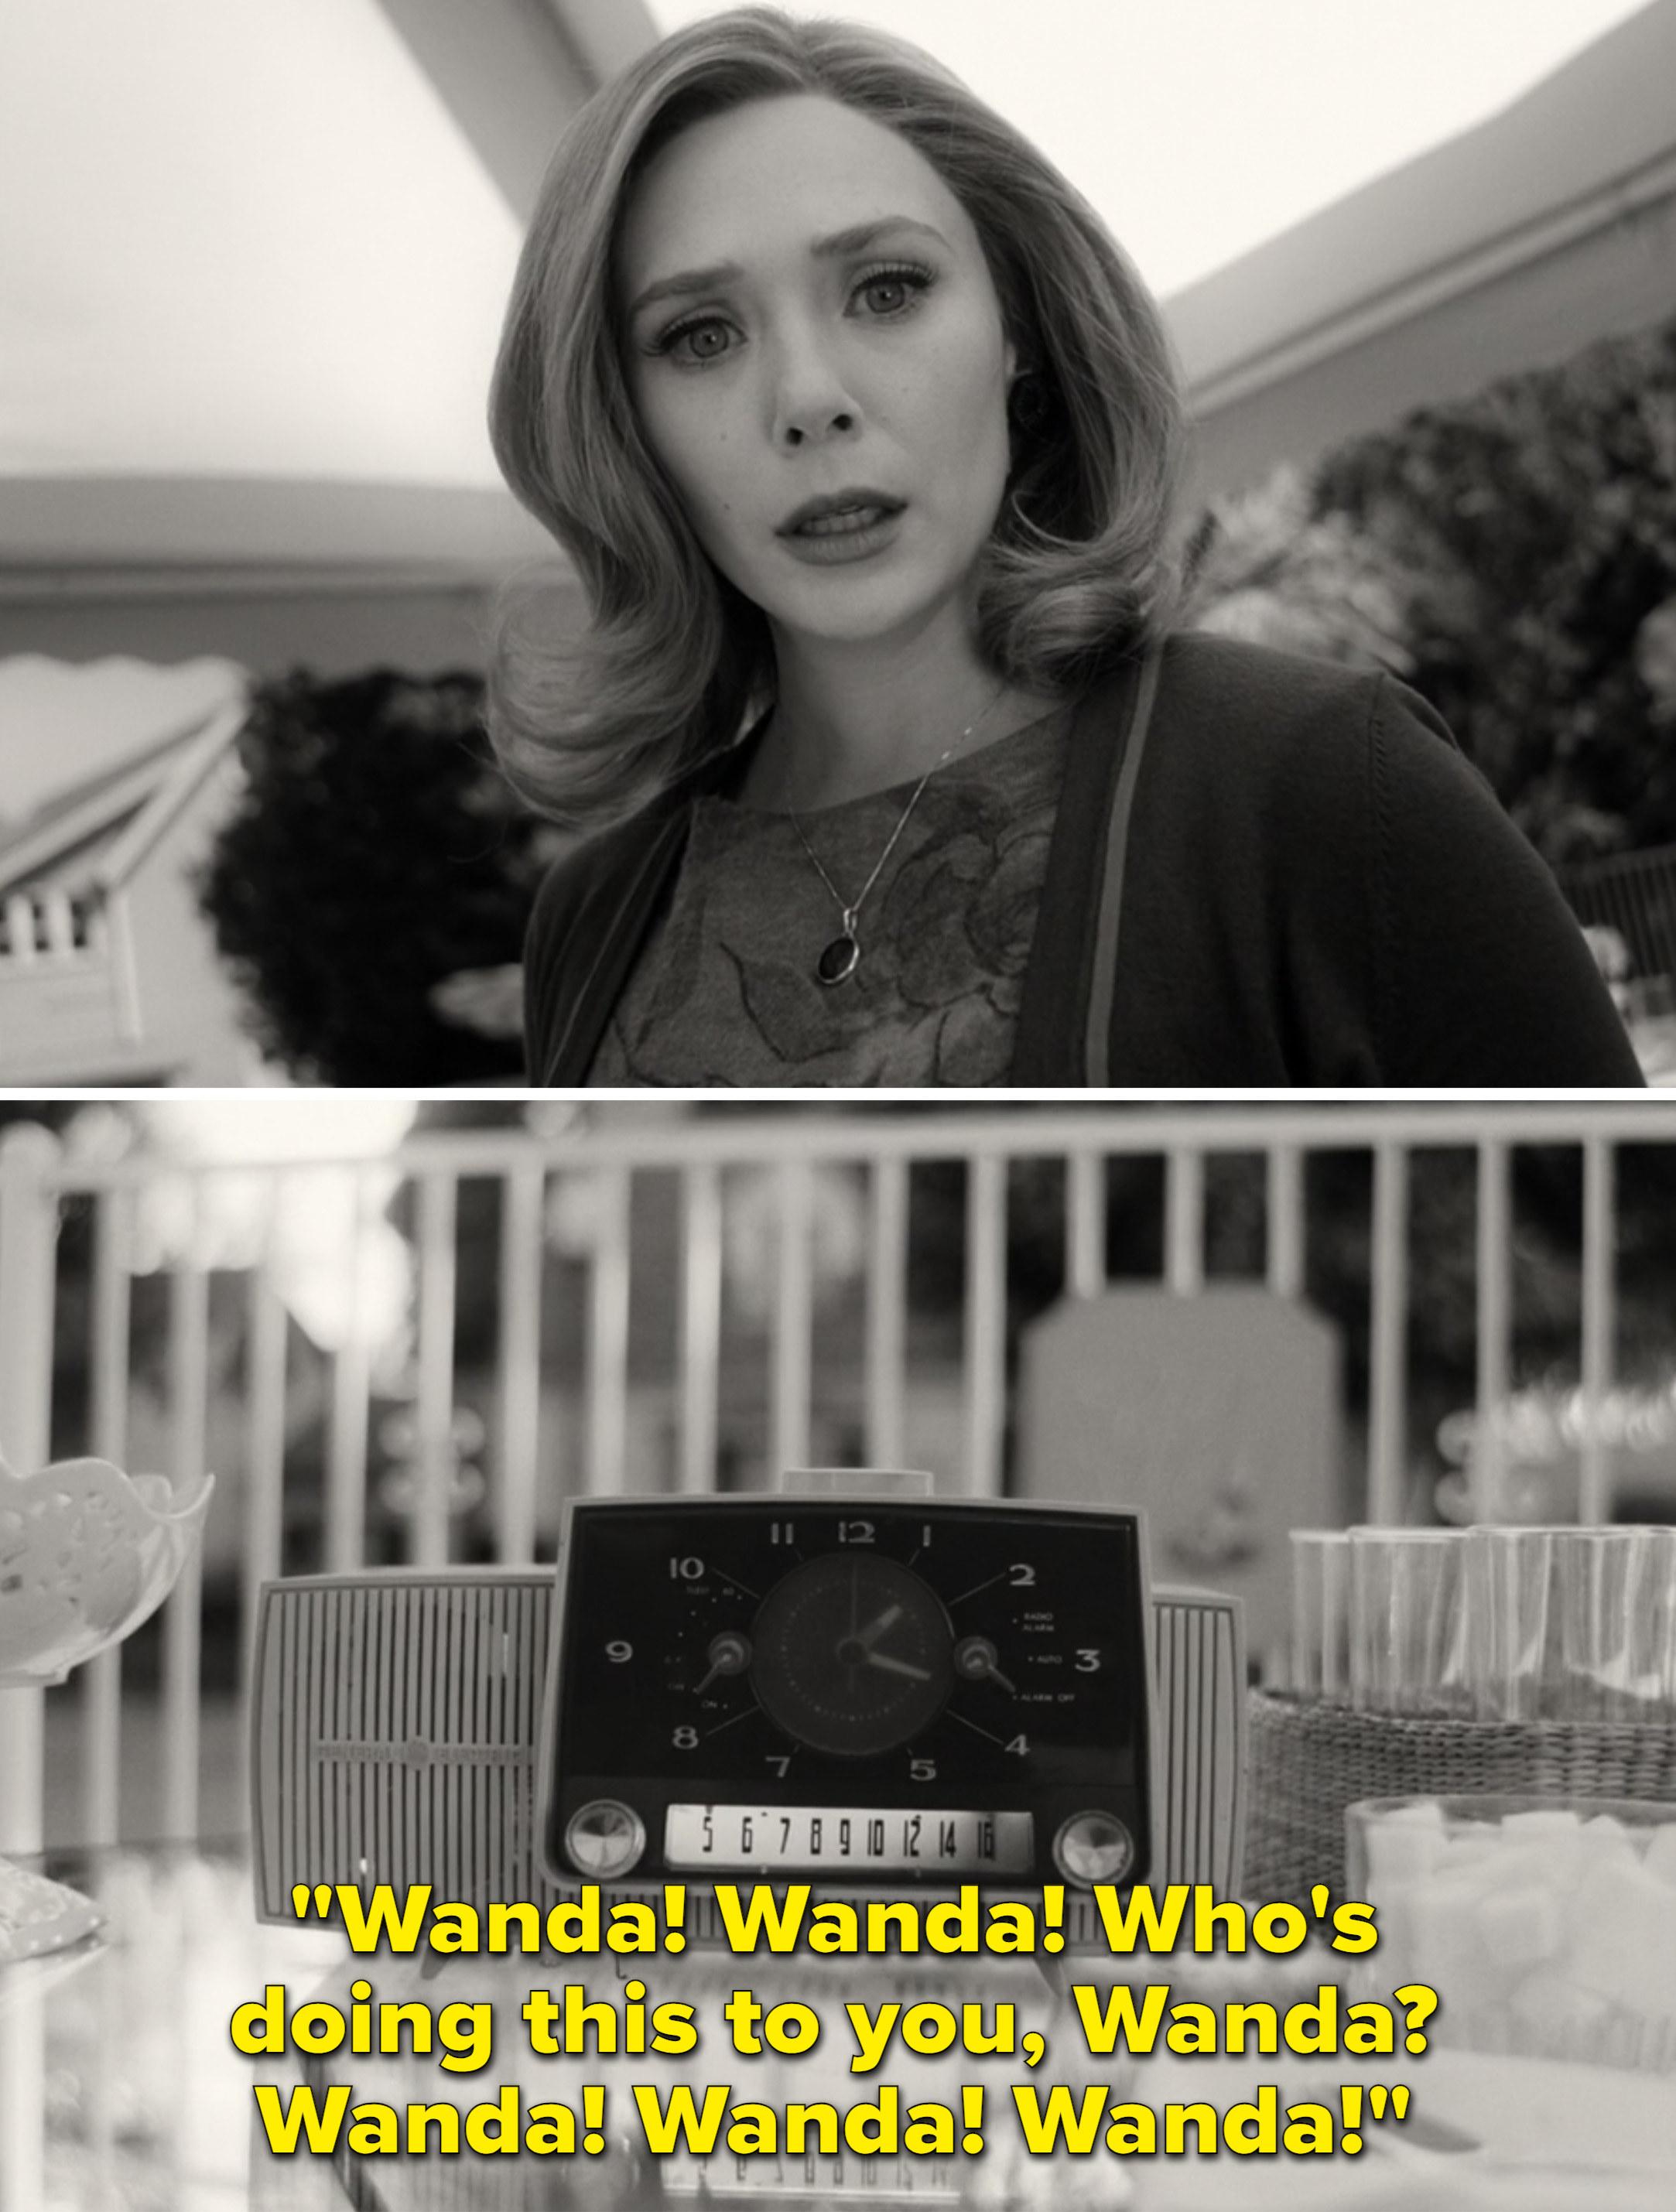 "A voice over the radio saying, ""Wanda! Wanda! Who's doing this to you, Wanda? Wanda! Wanda! Wanda!"""